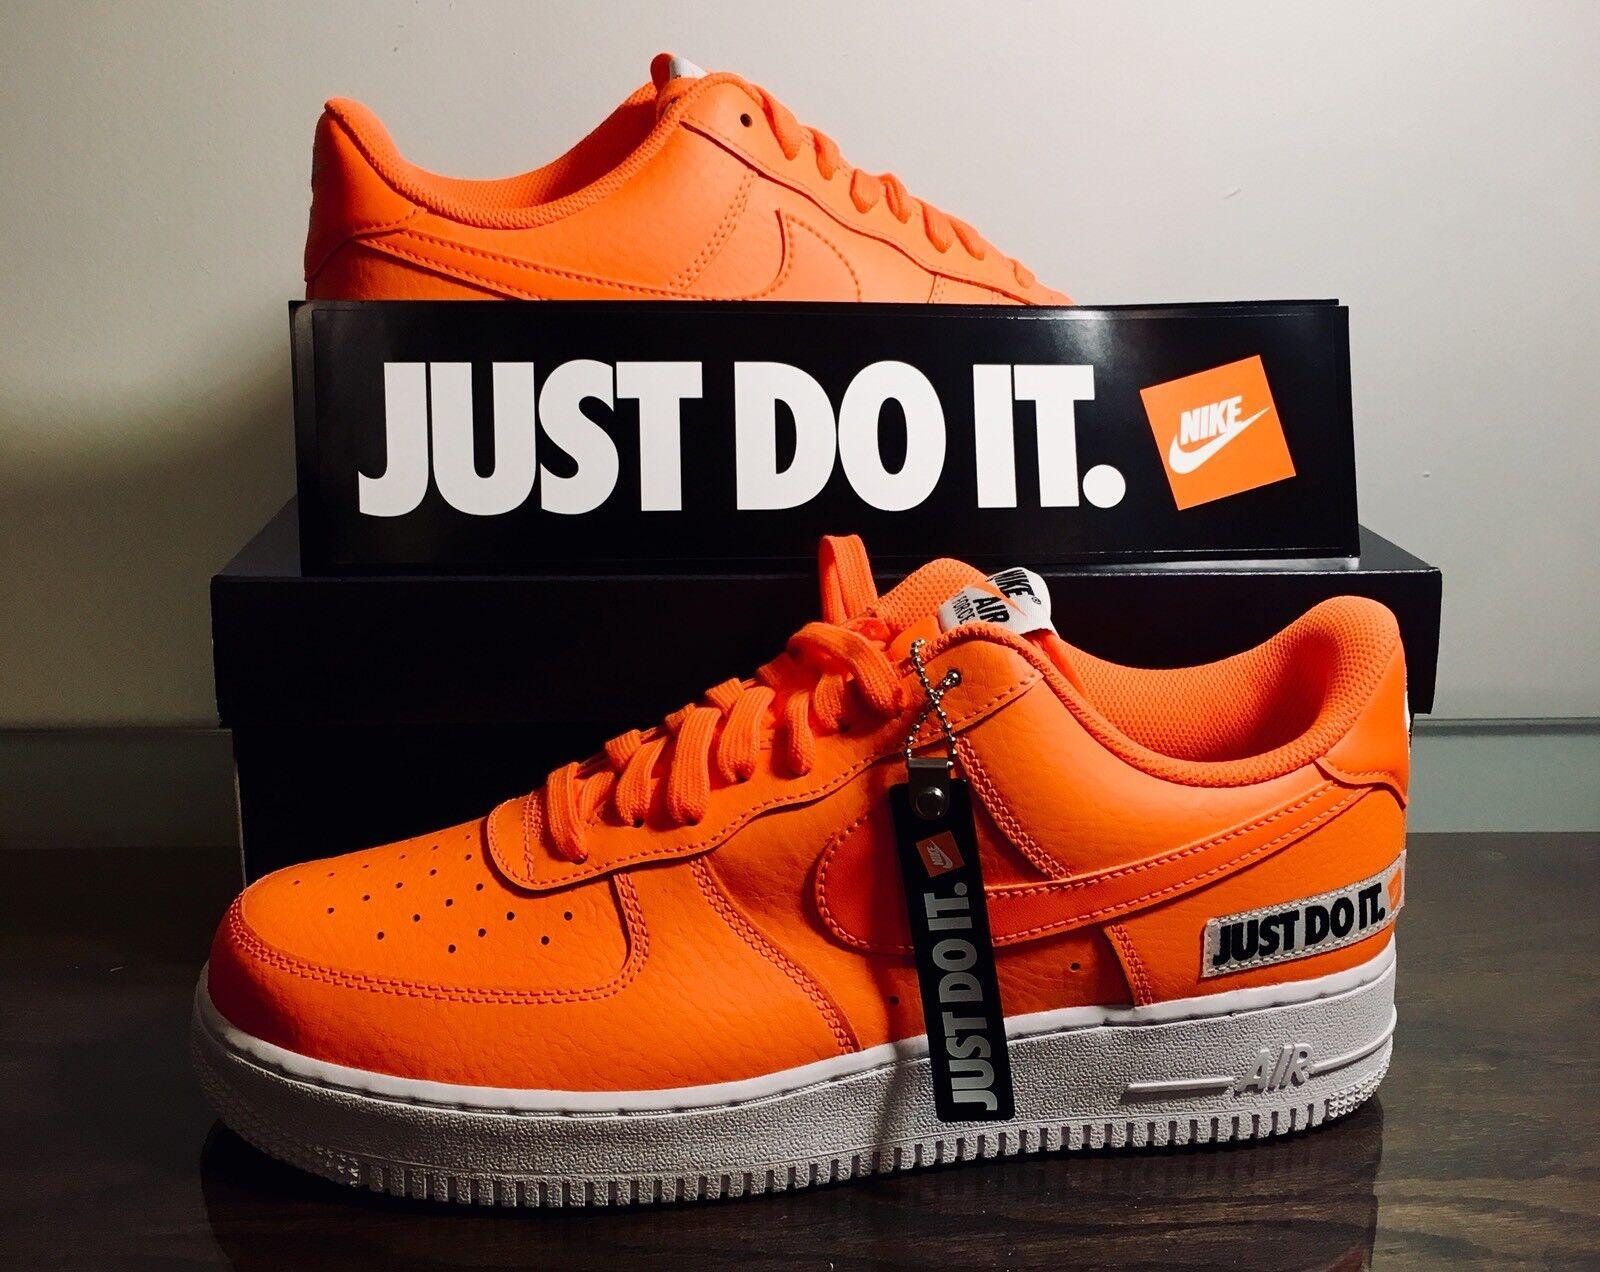 Nike baja Air Force 1 baja Nike JDI Collection - confortable b044c2